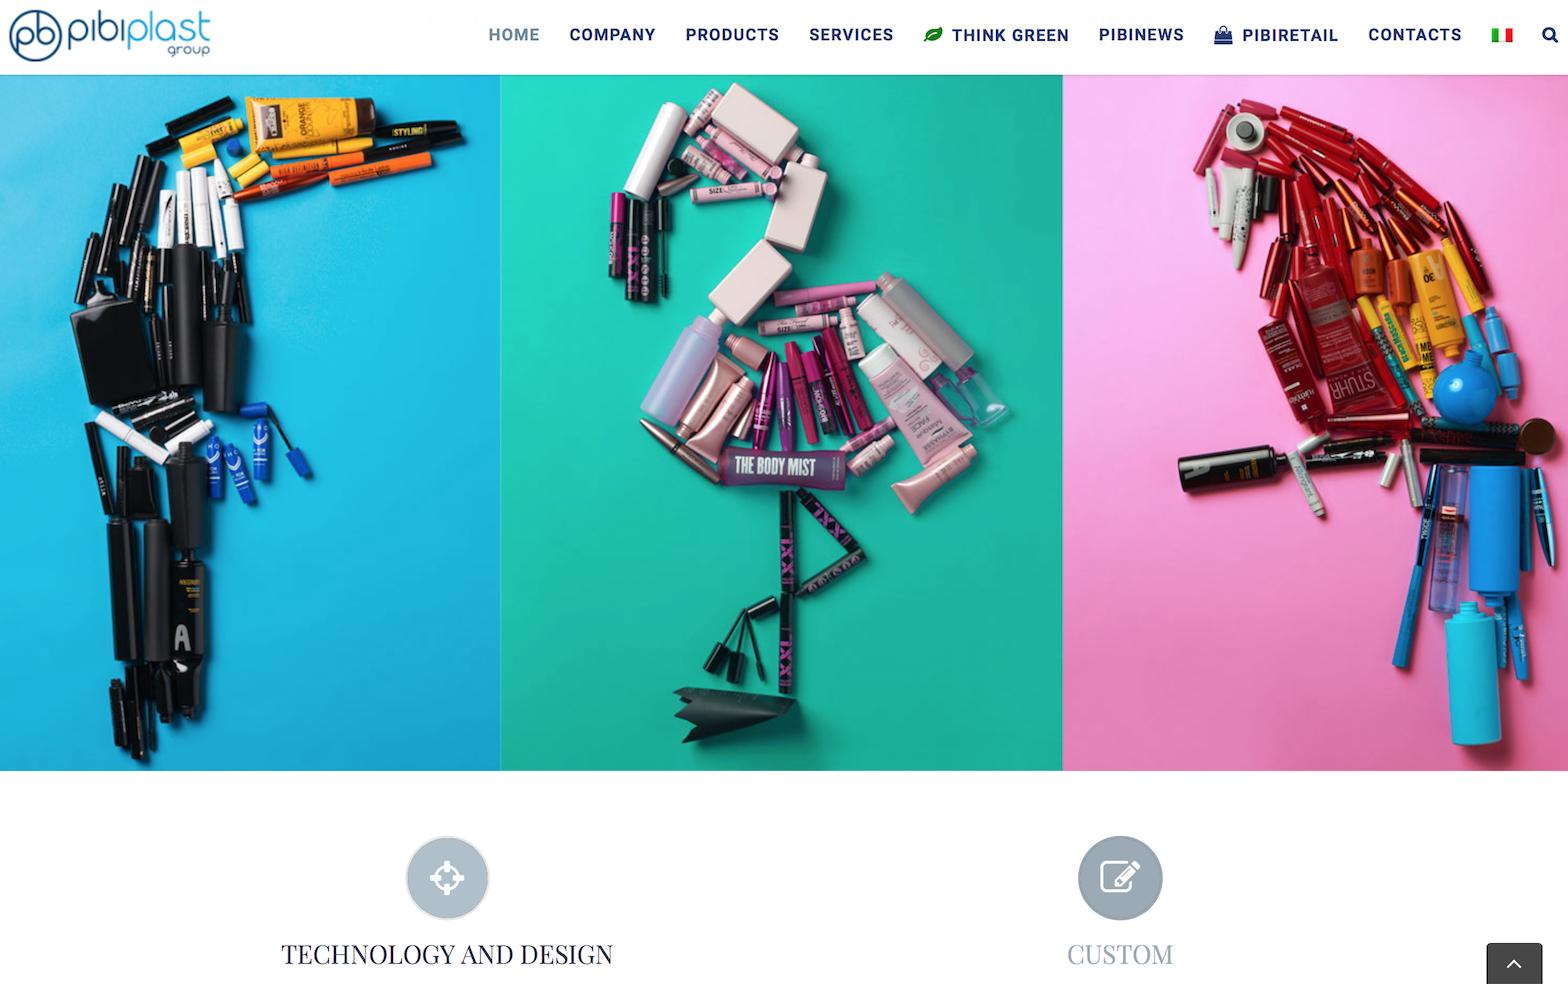 L Catterton 联手欧洲私募基金收购意大利环保美妆塑料包装生产商 Pibiplast 多数股权